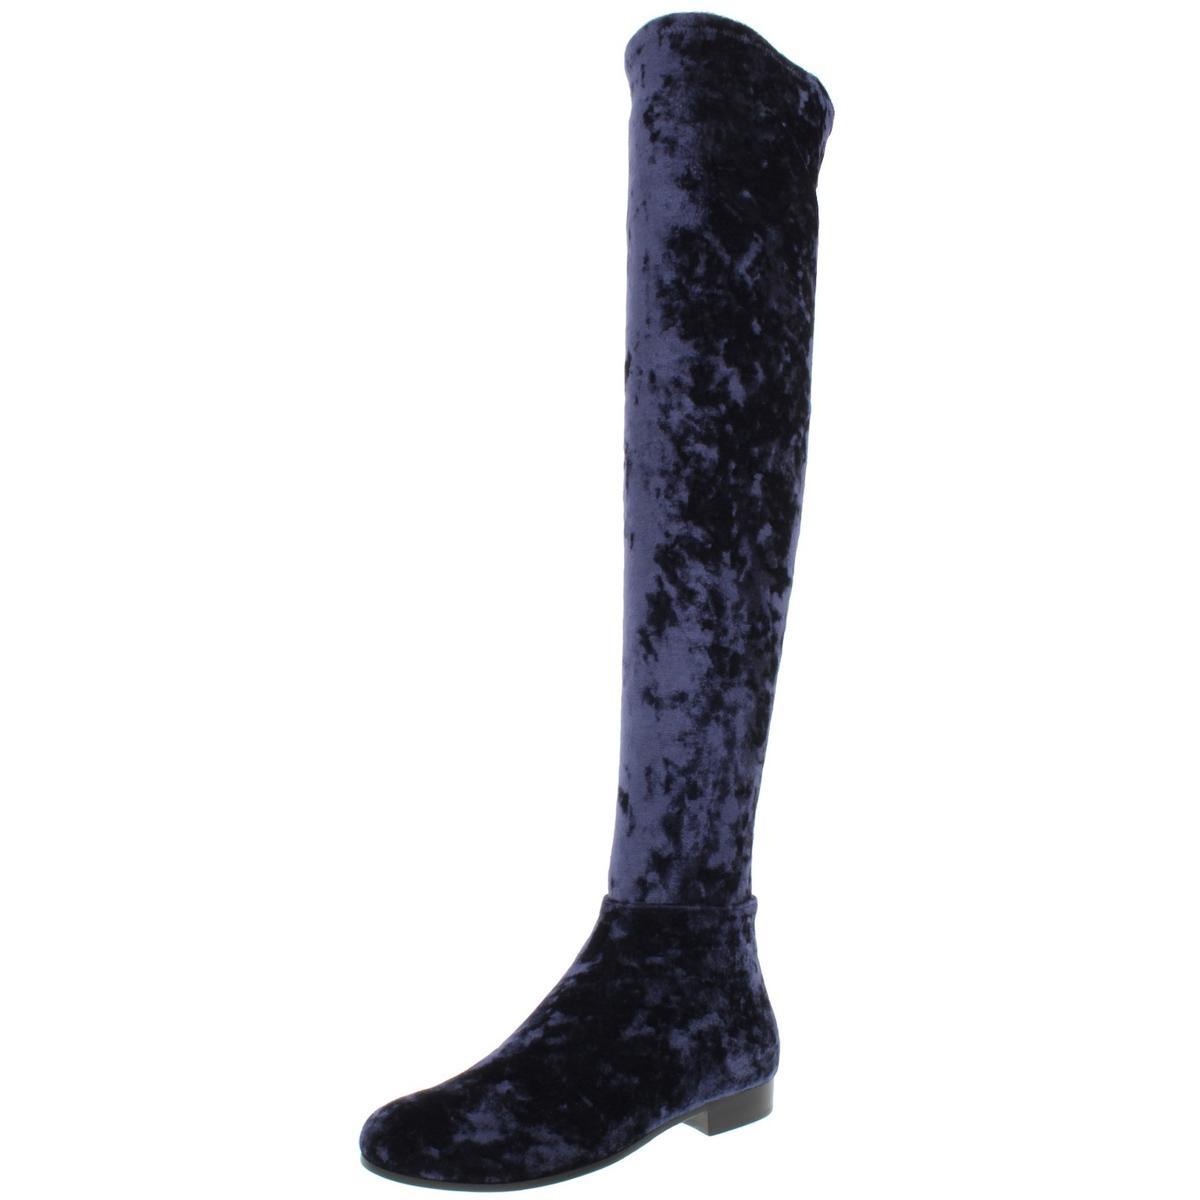 Jimmy-Choo-Womens-Myren-Navy-Over-The-Knee-Boots-Shoes-36-Medium-B-M-BHFO-1167